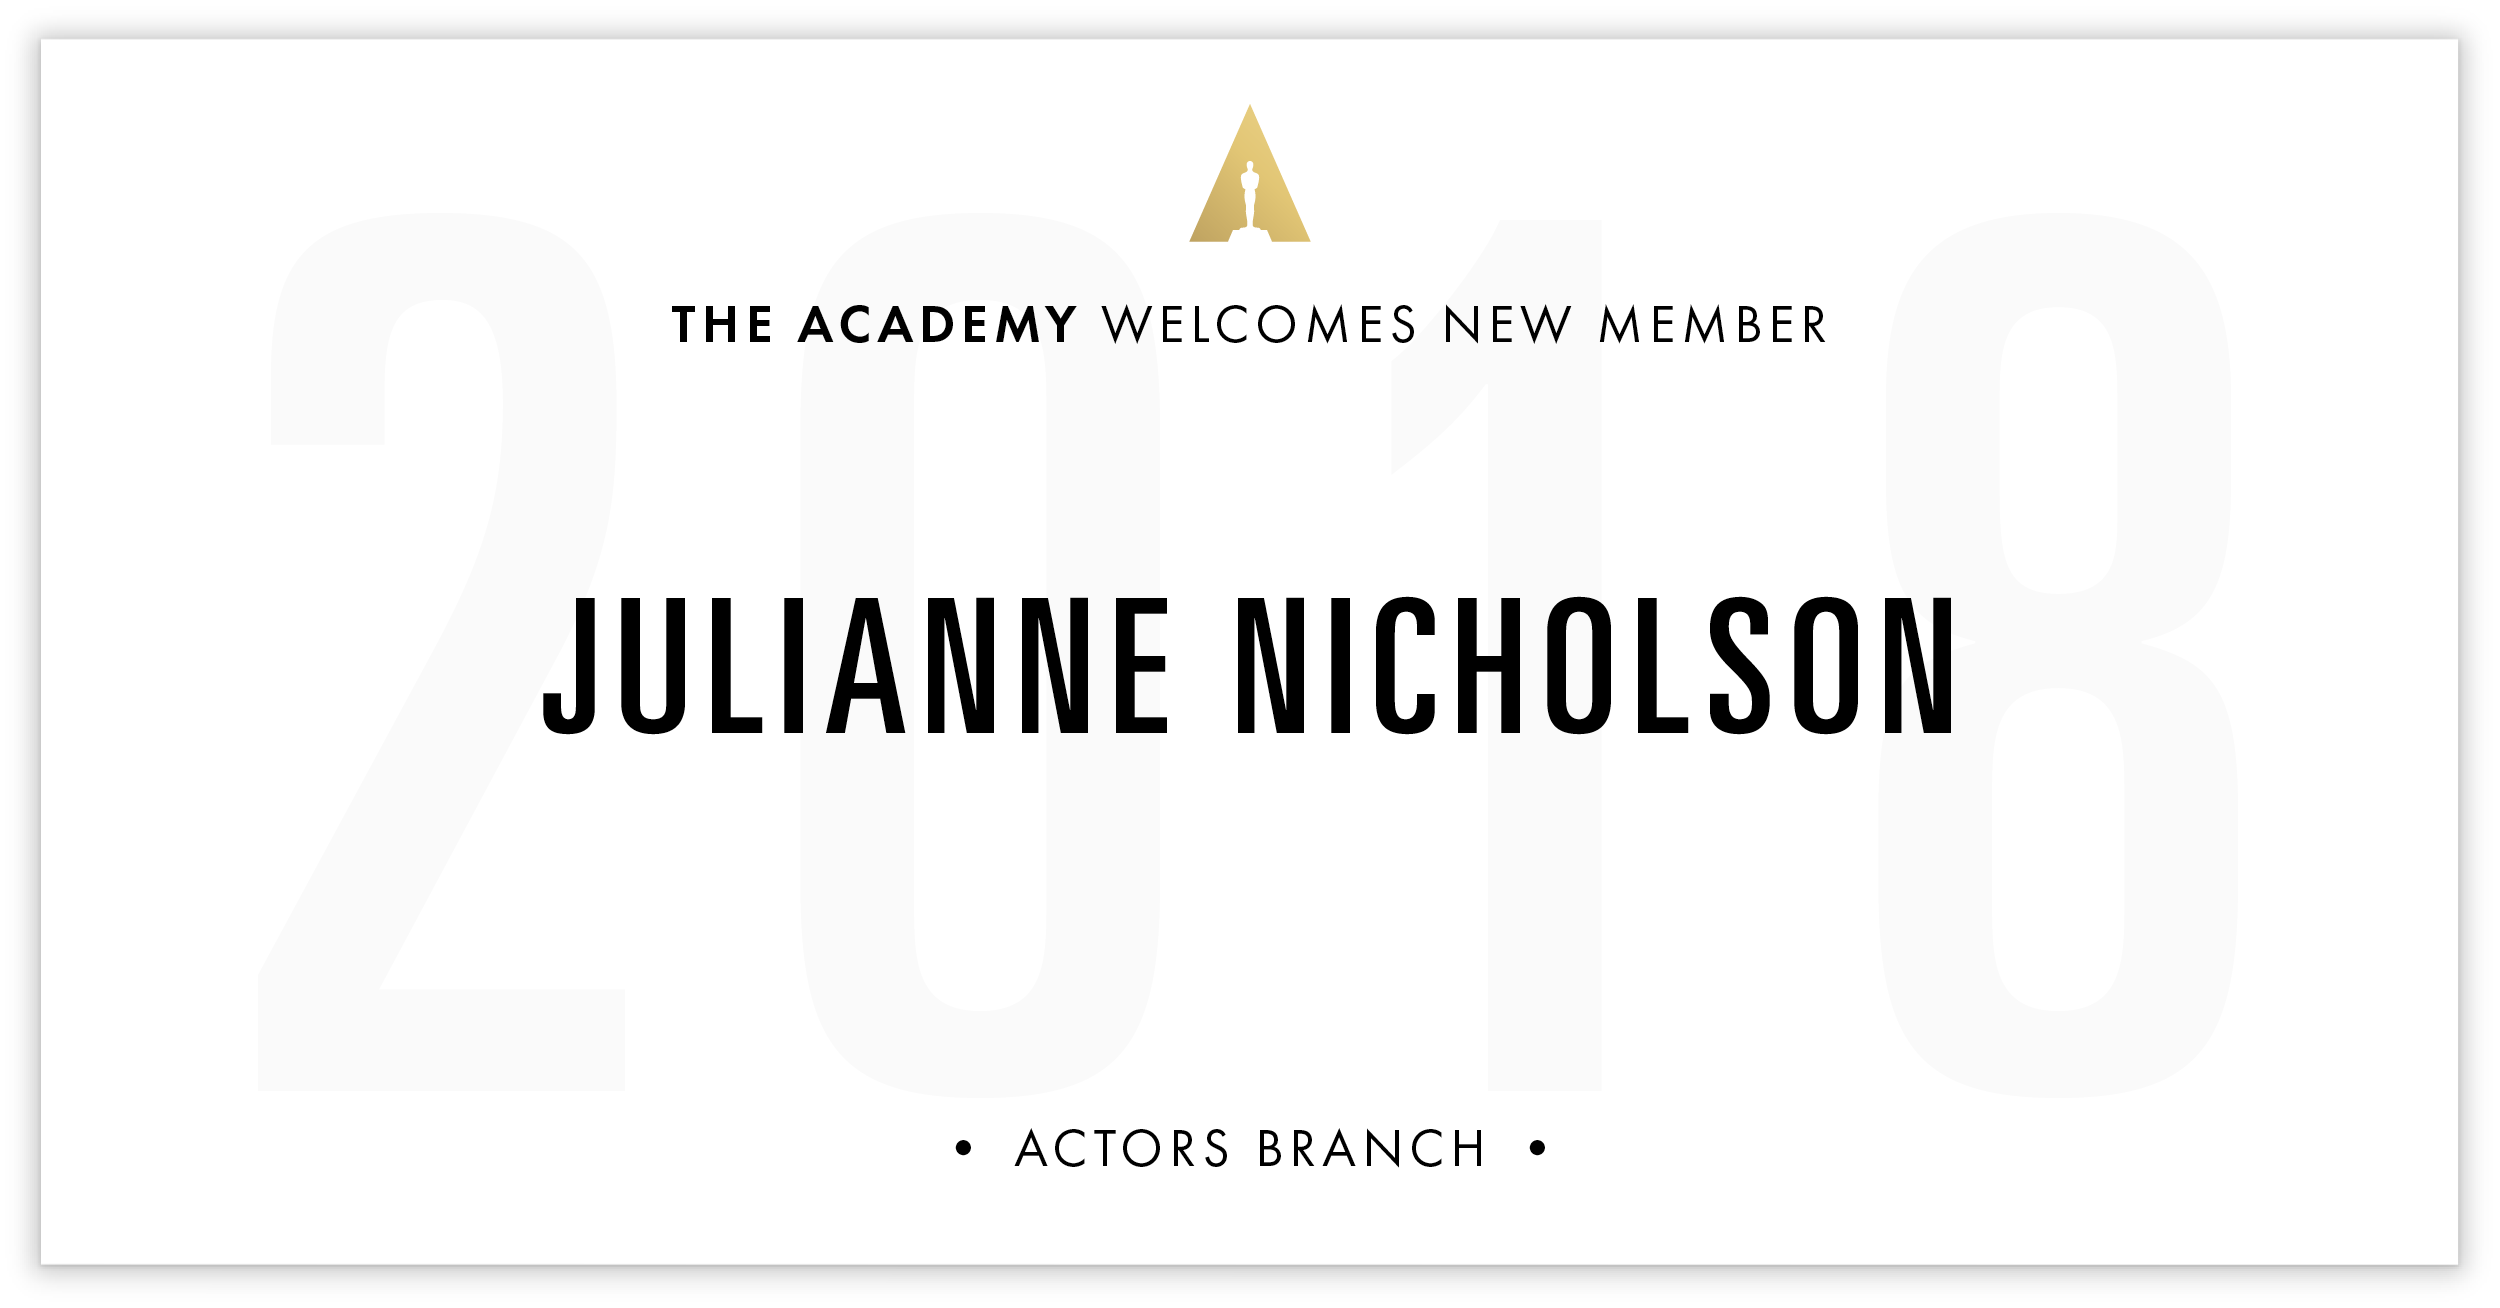 Julianne Nicholson is invited!